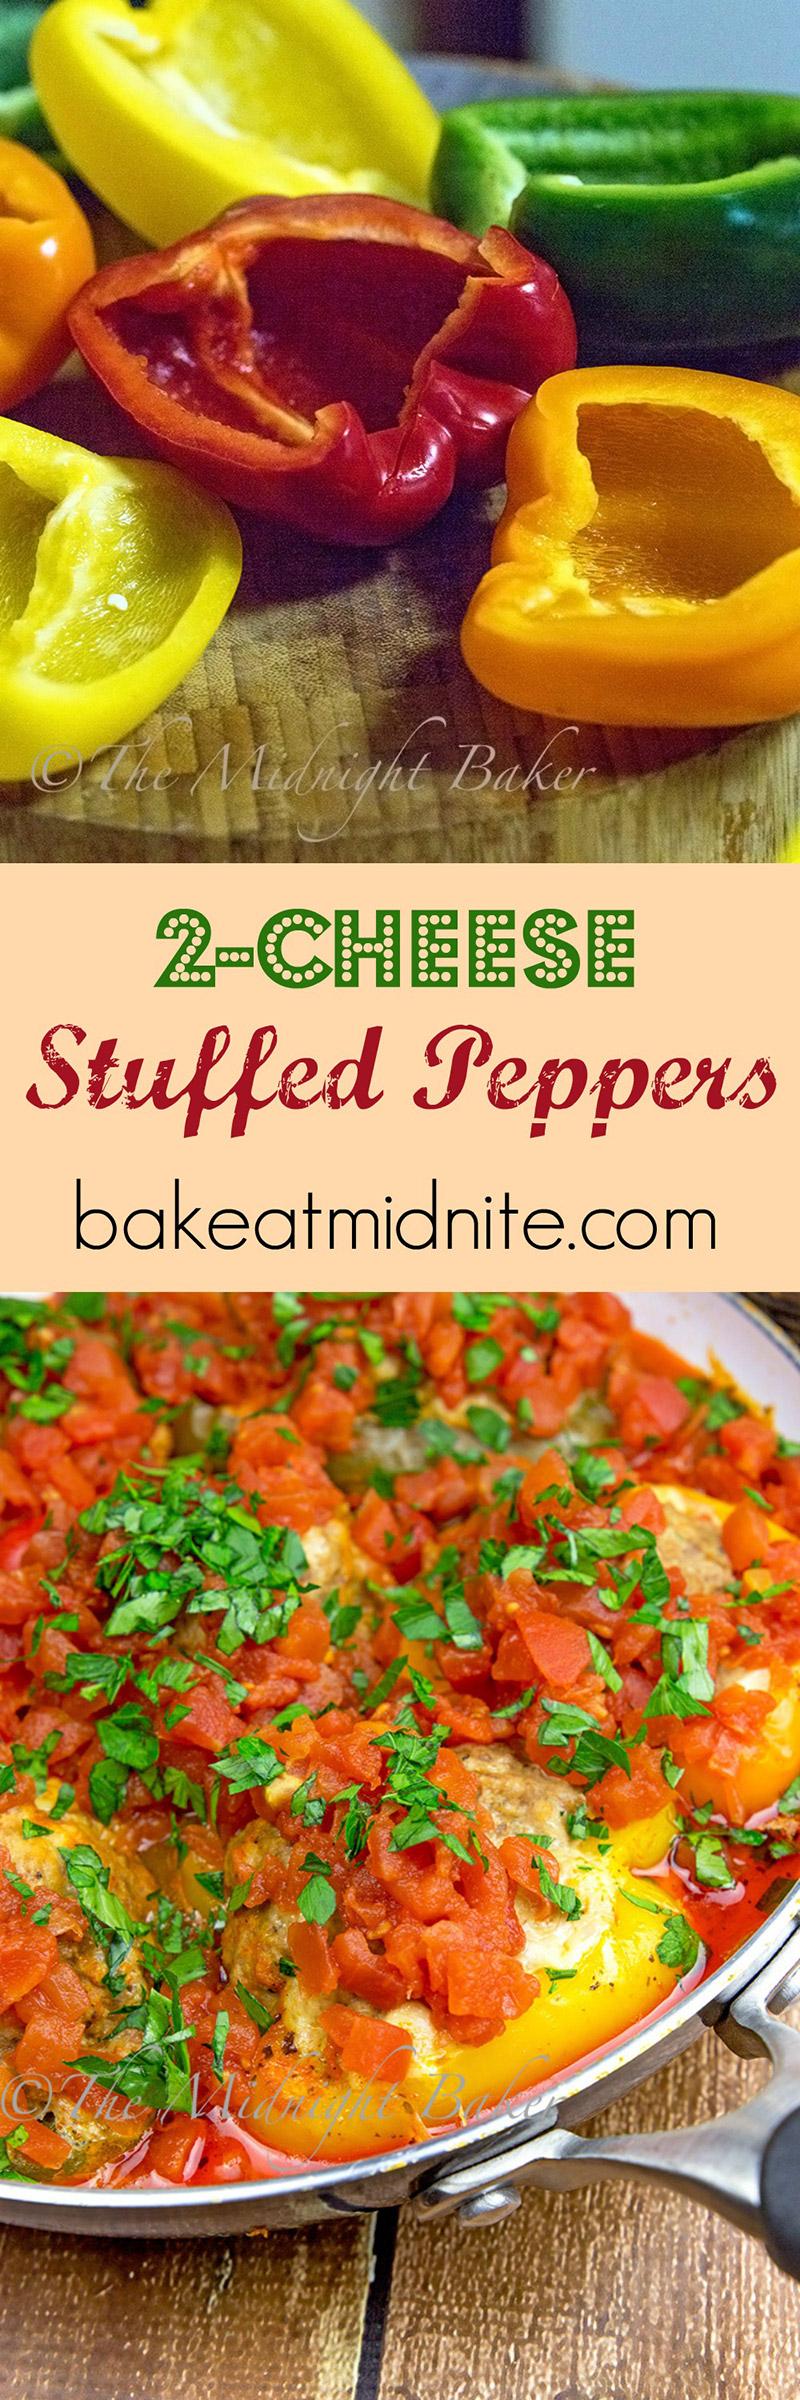 2-Cheese Stuffed Peppers